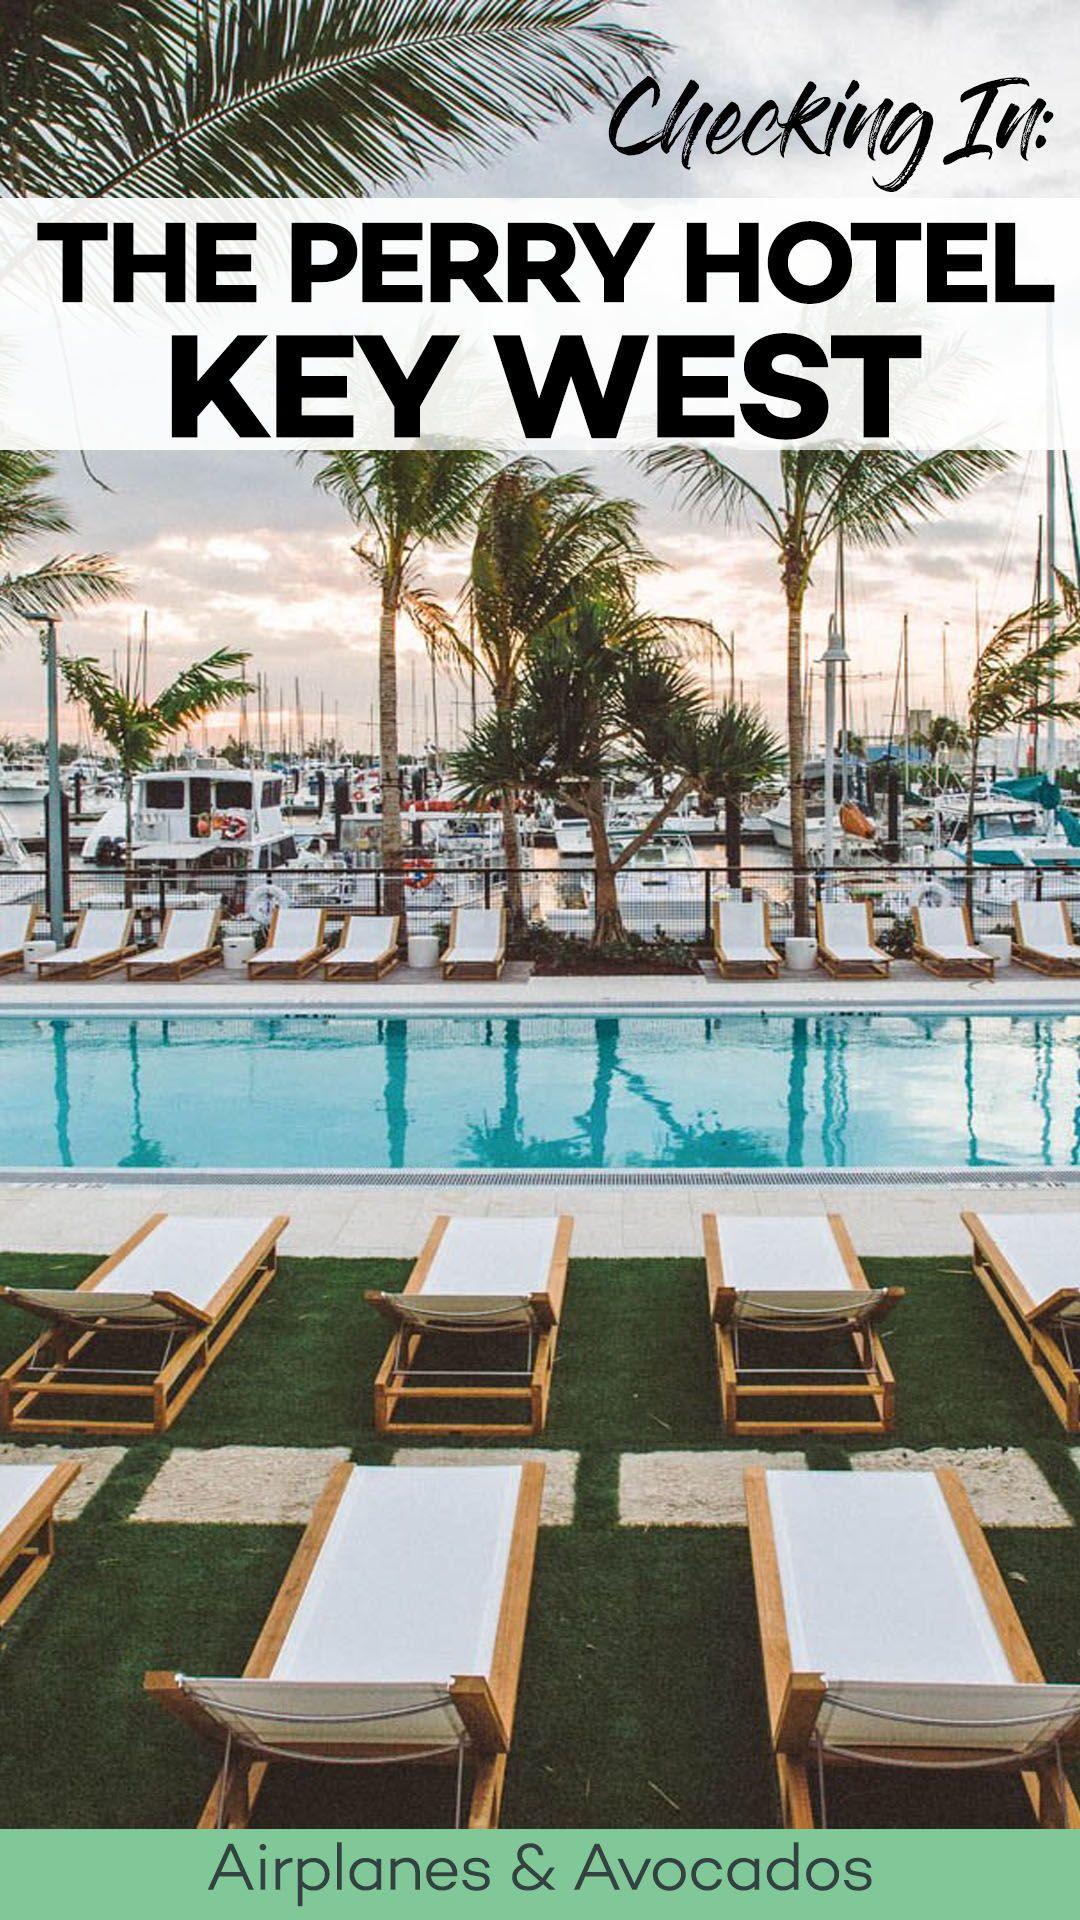 Perry Hotel Key West - Florida Keys Music Events